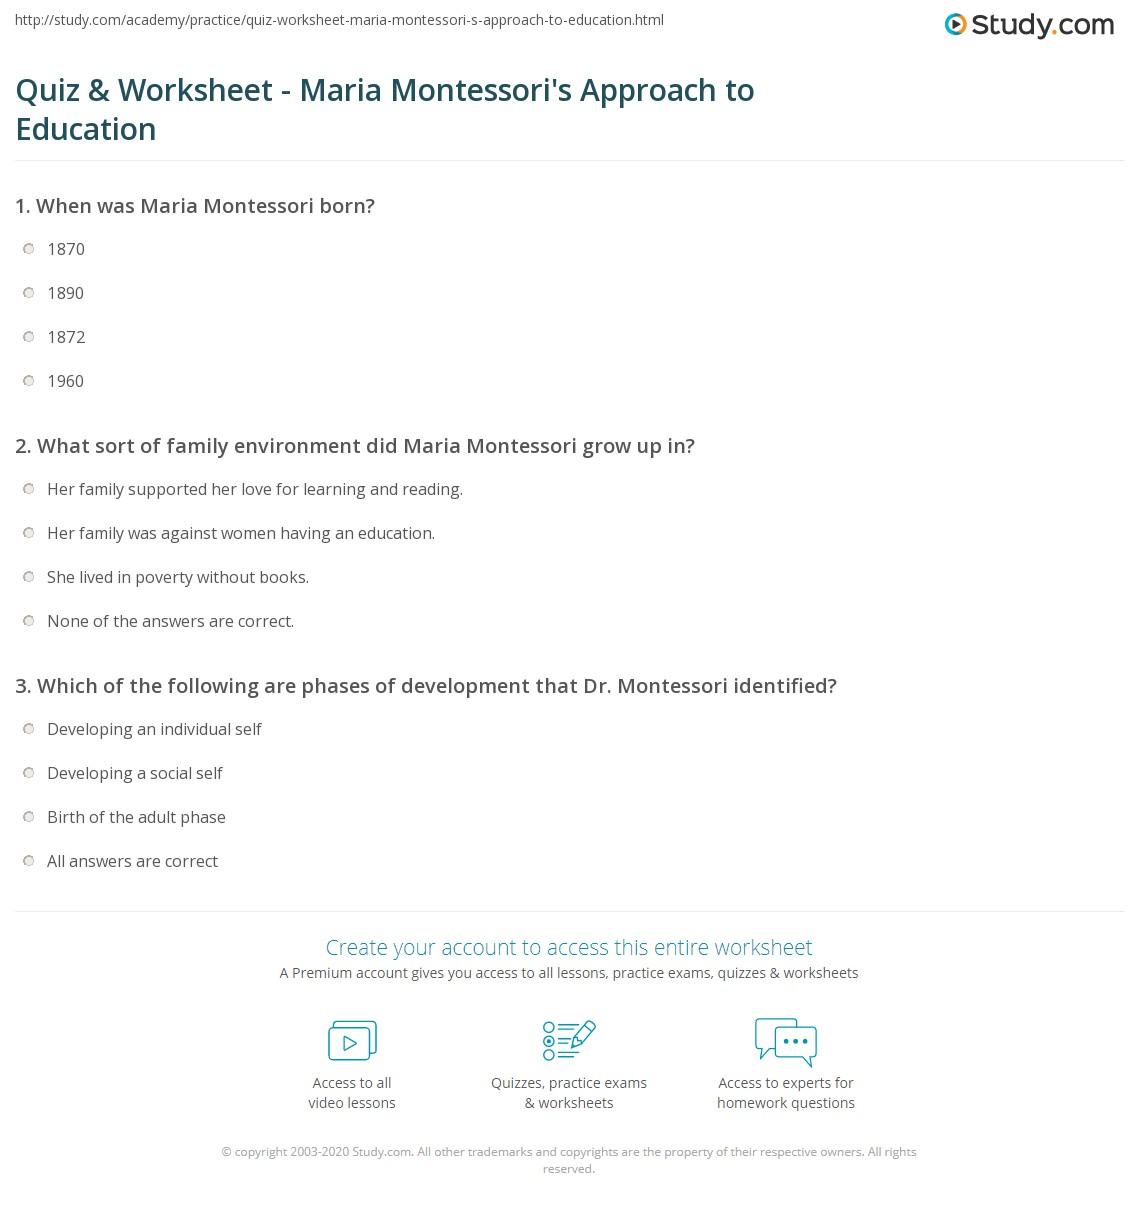 Quiz Worksheet Maria Montessoris Approach To Education Study